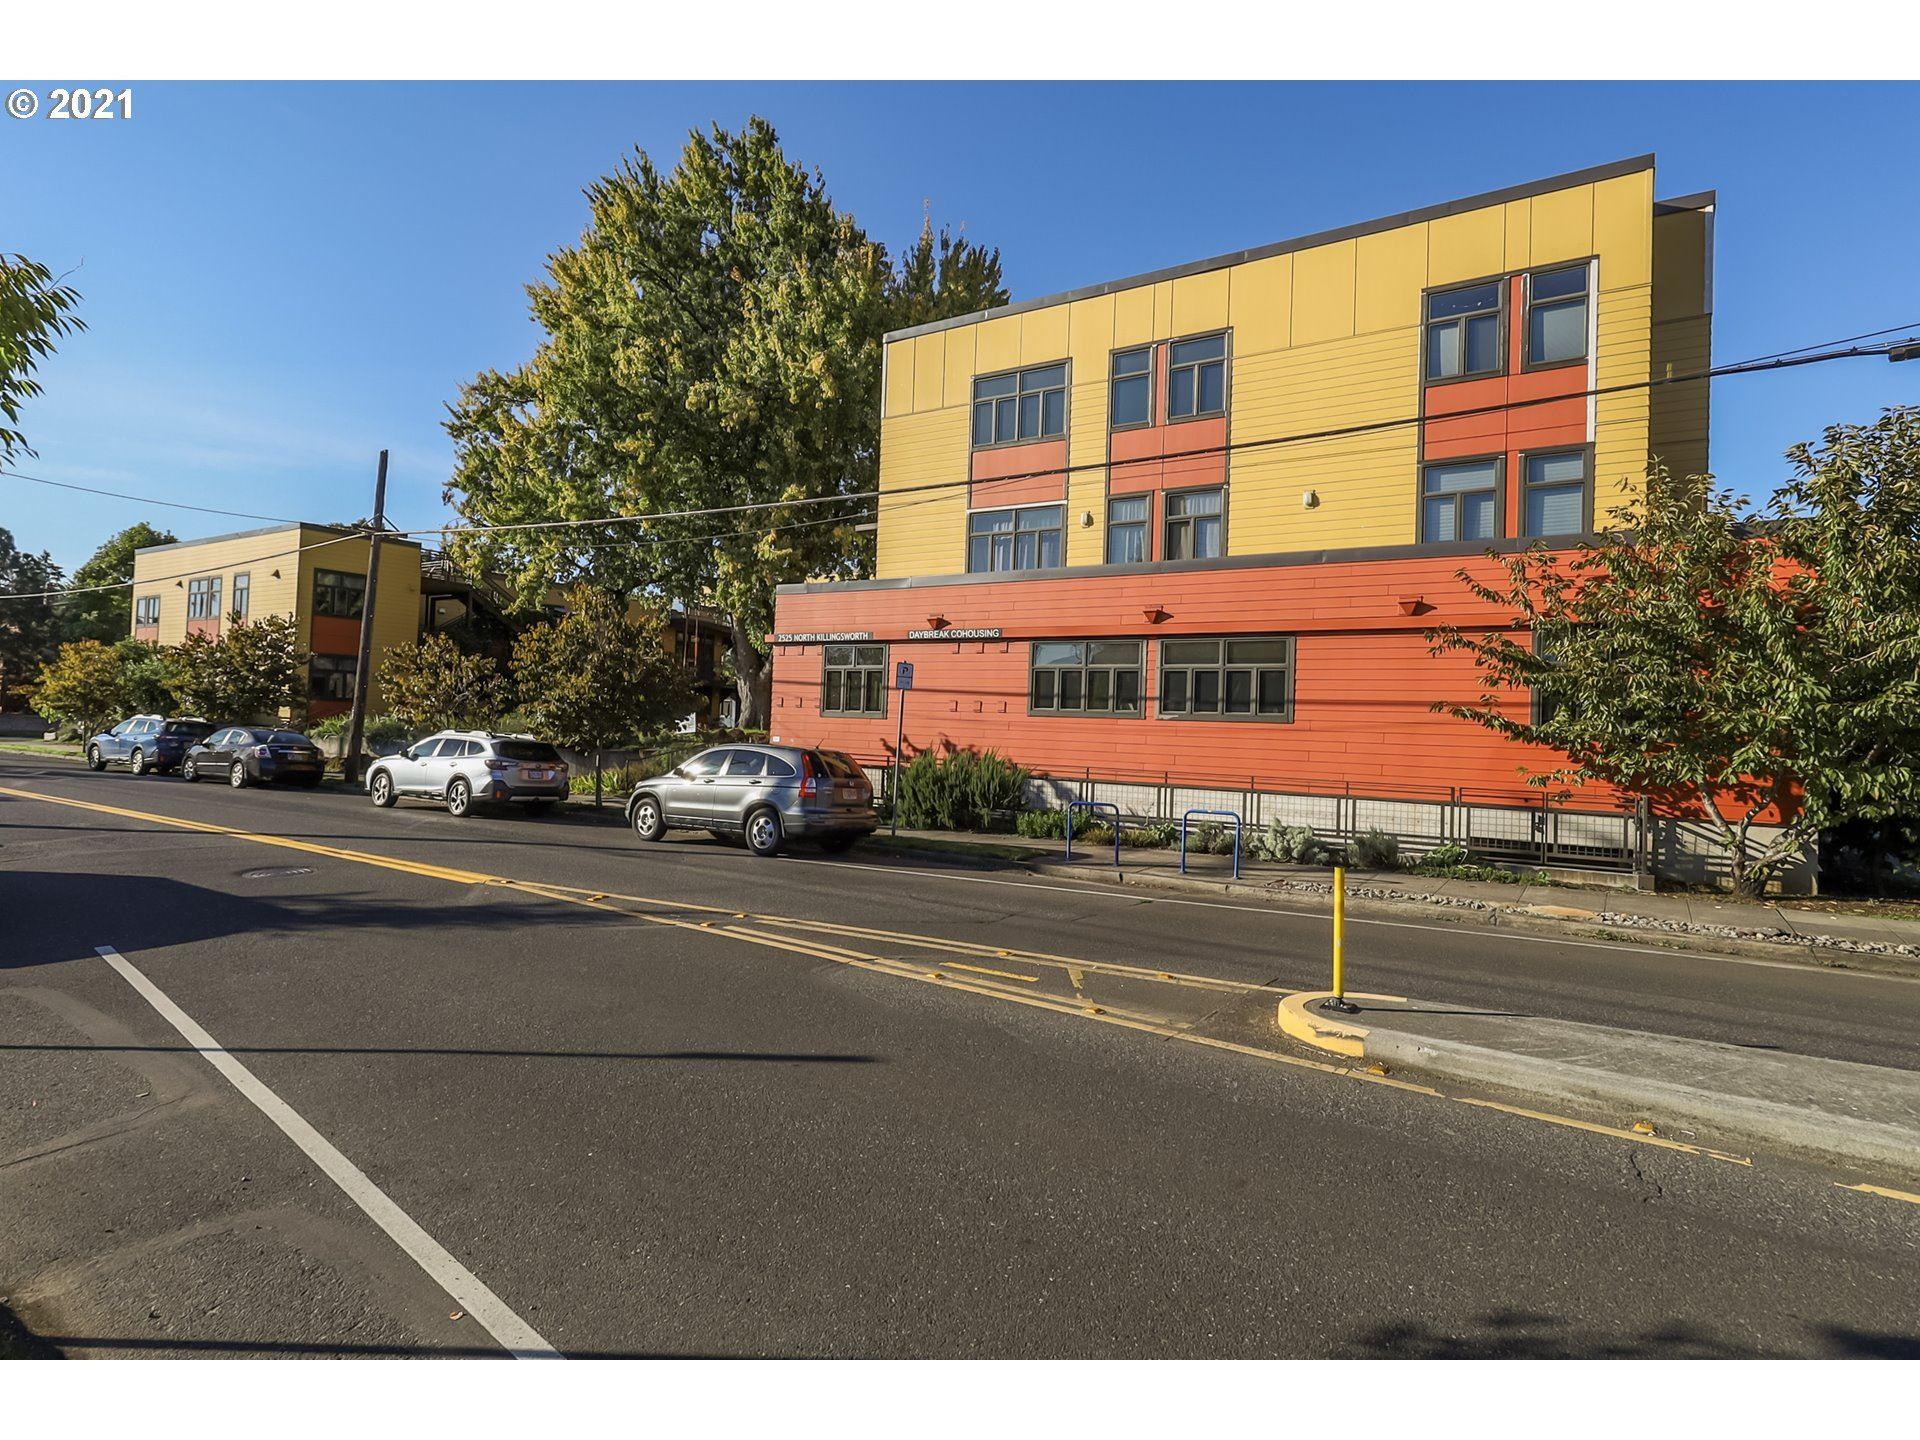 2525 N KILLINGSWORTH ST #312, Portland, OR 97217 - MLS#: 21398496